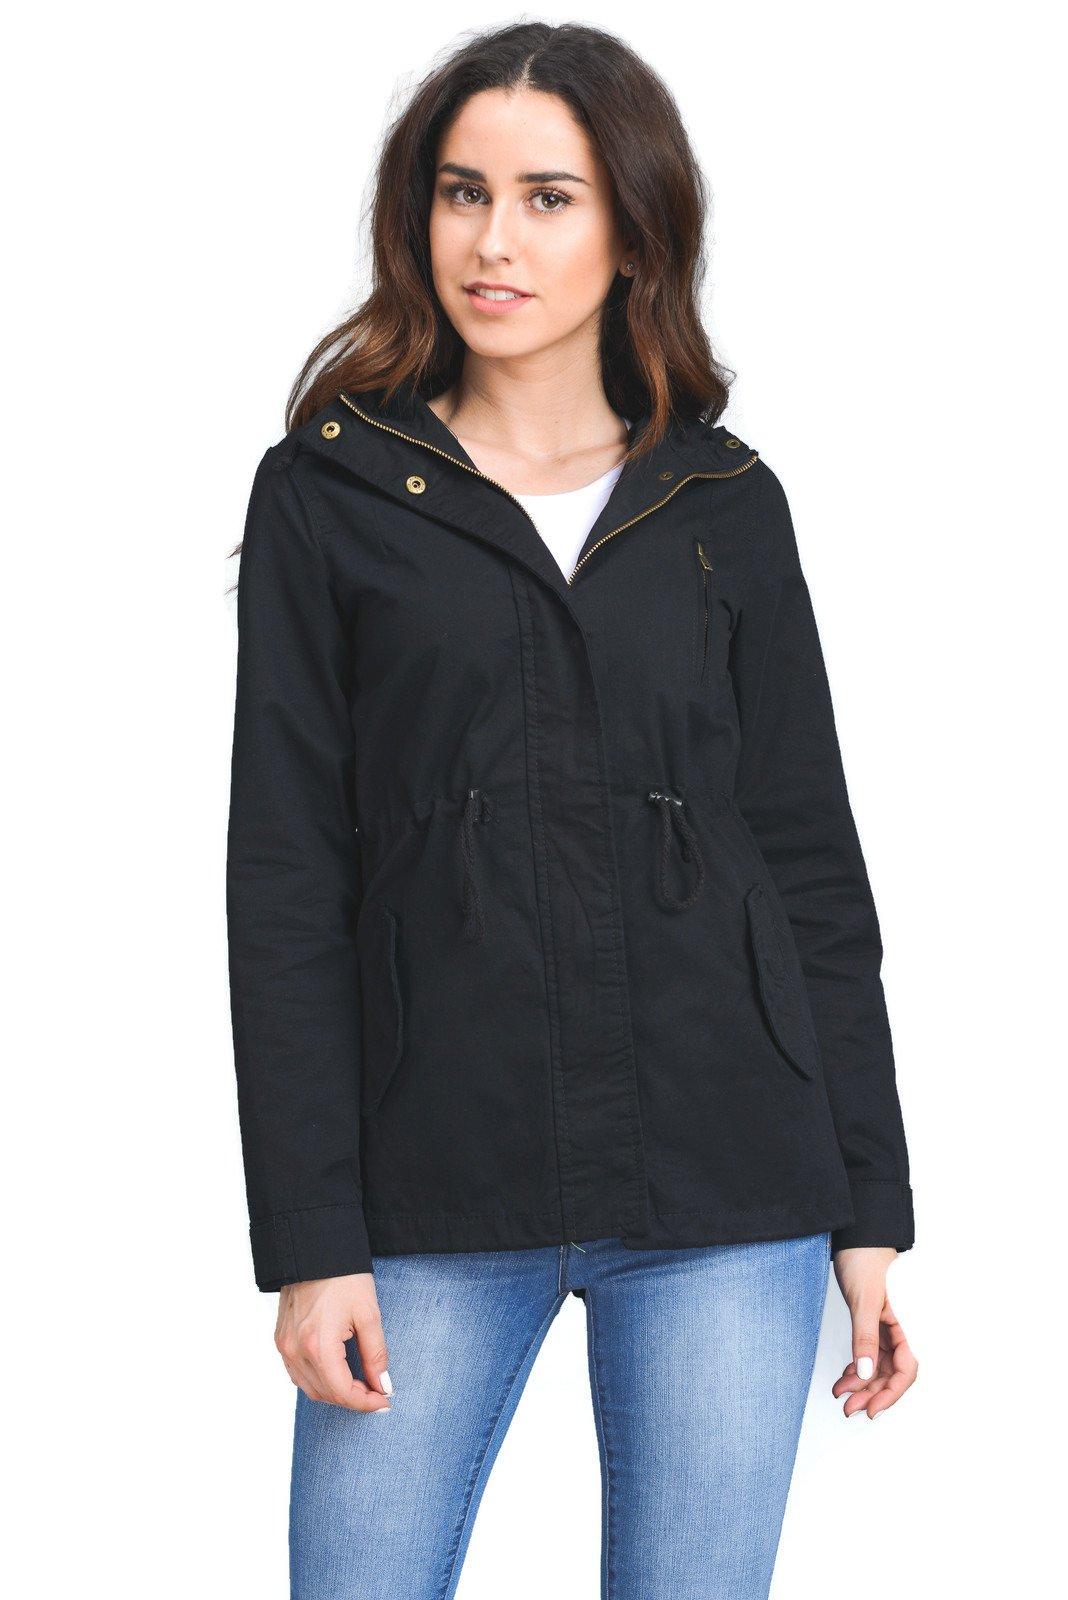 FASHION BOOMY Womens Zip Up Military Anorak Jacket W/Hood (Large, Black-43)